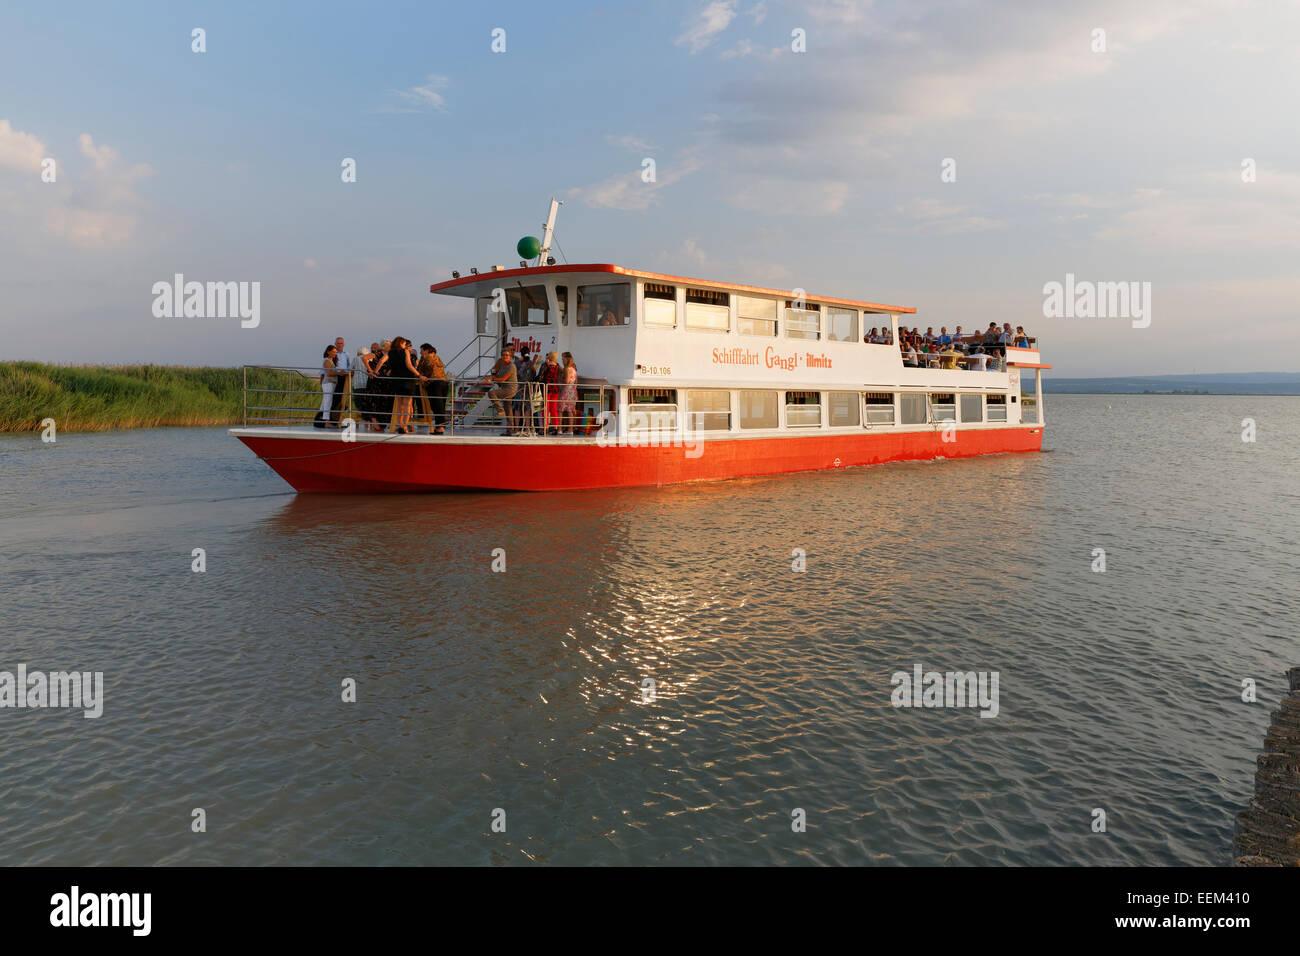 Passenger ship on Lake Neusiedl, Illmitz, Northern Burgenland, Burgenland, Austria - Stock Image